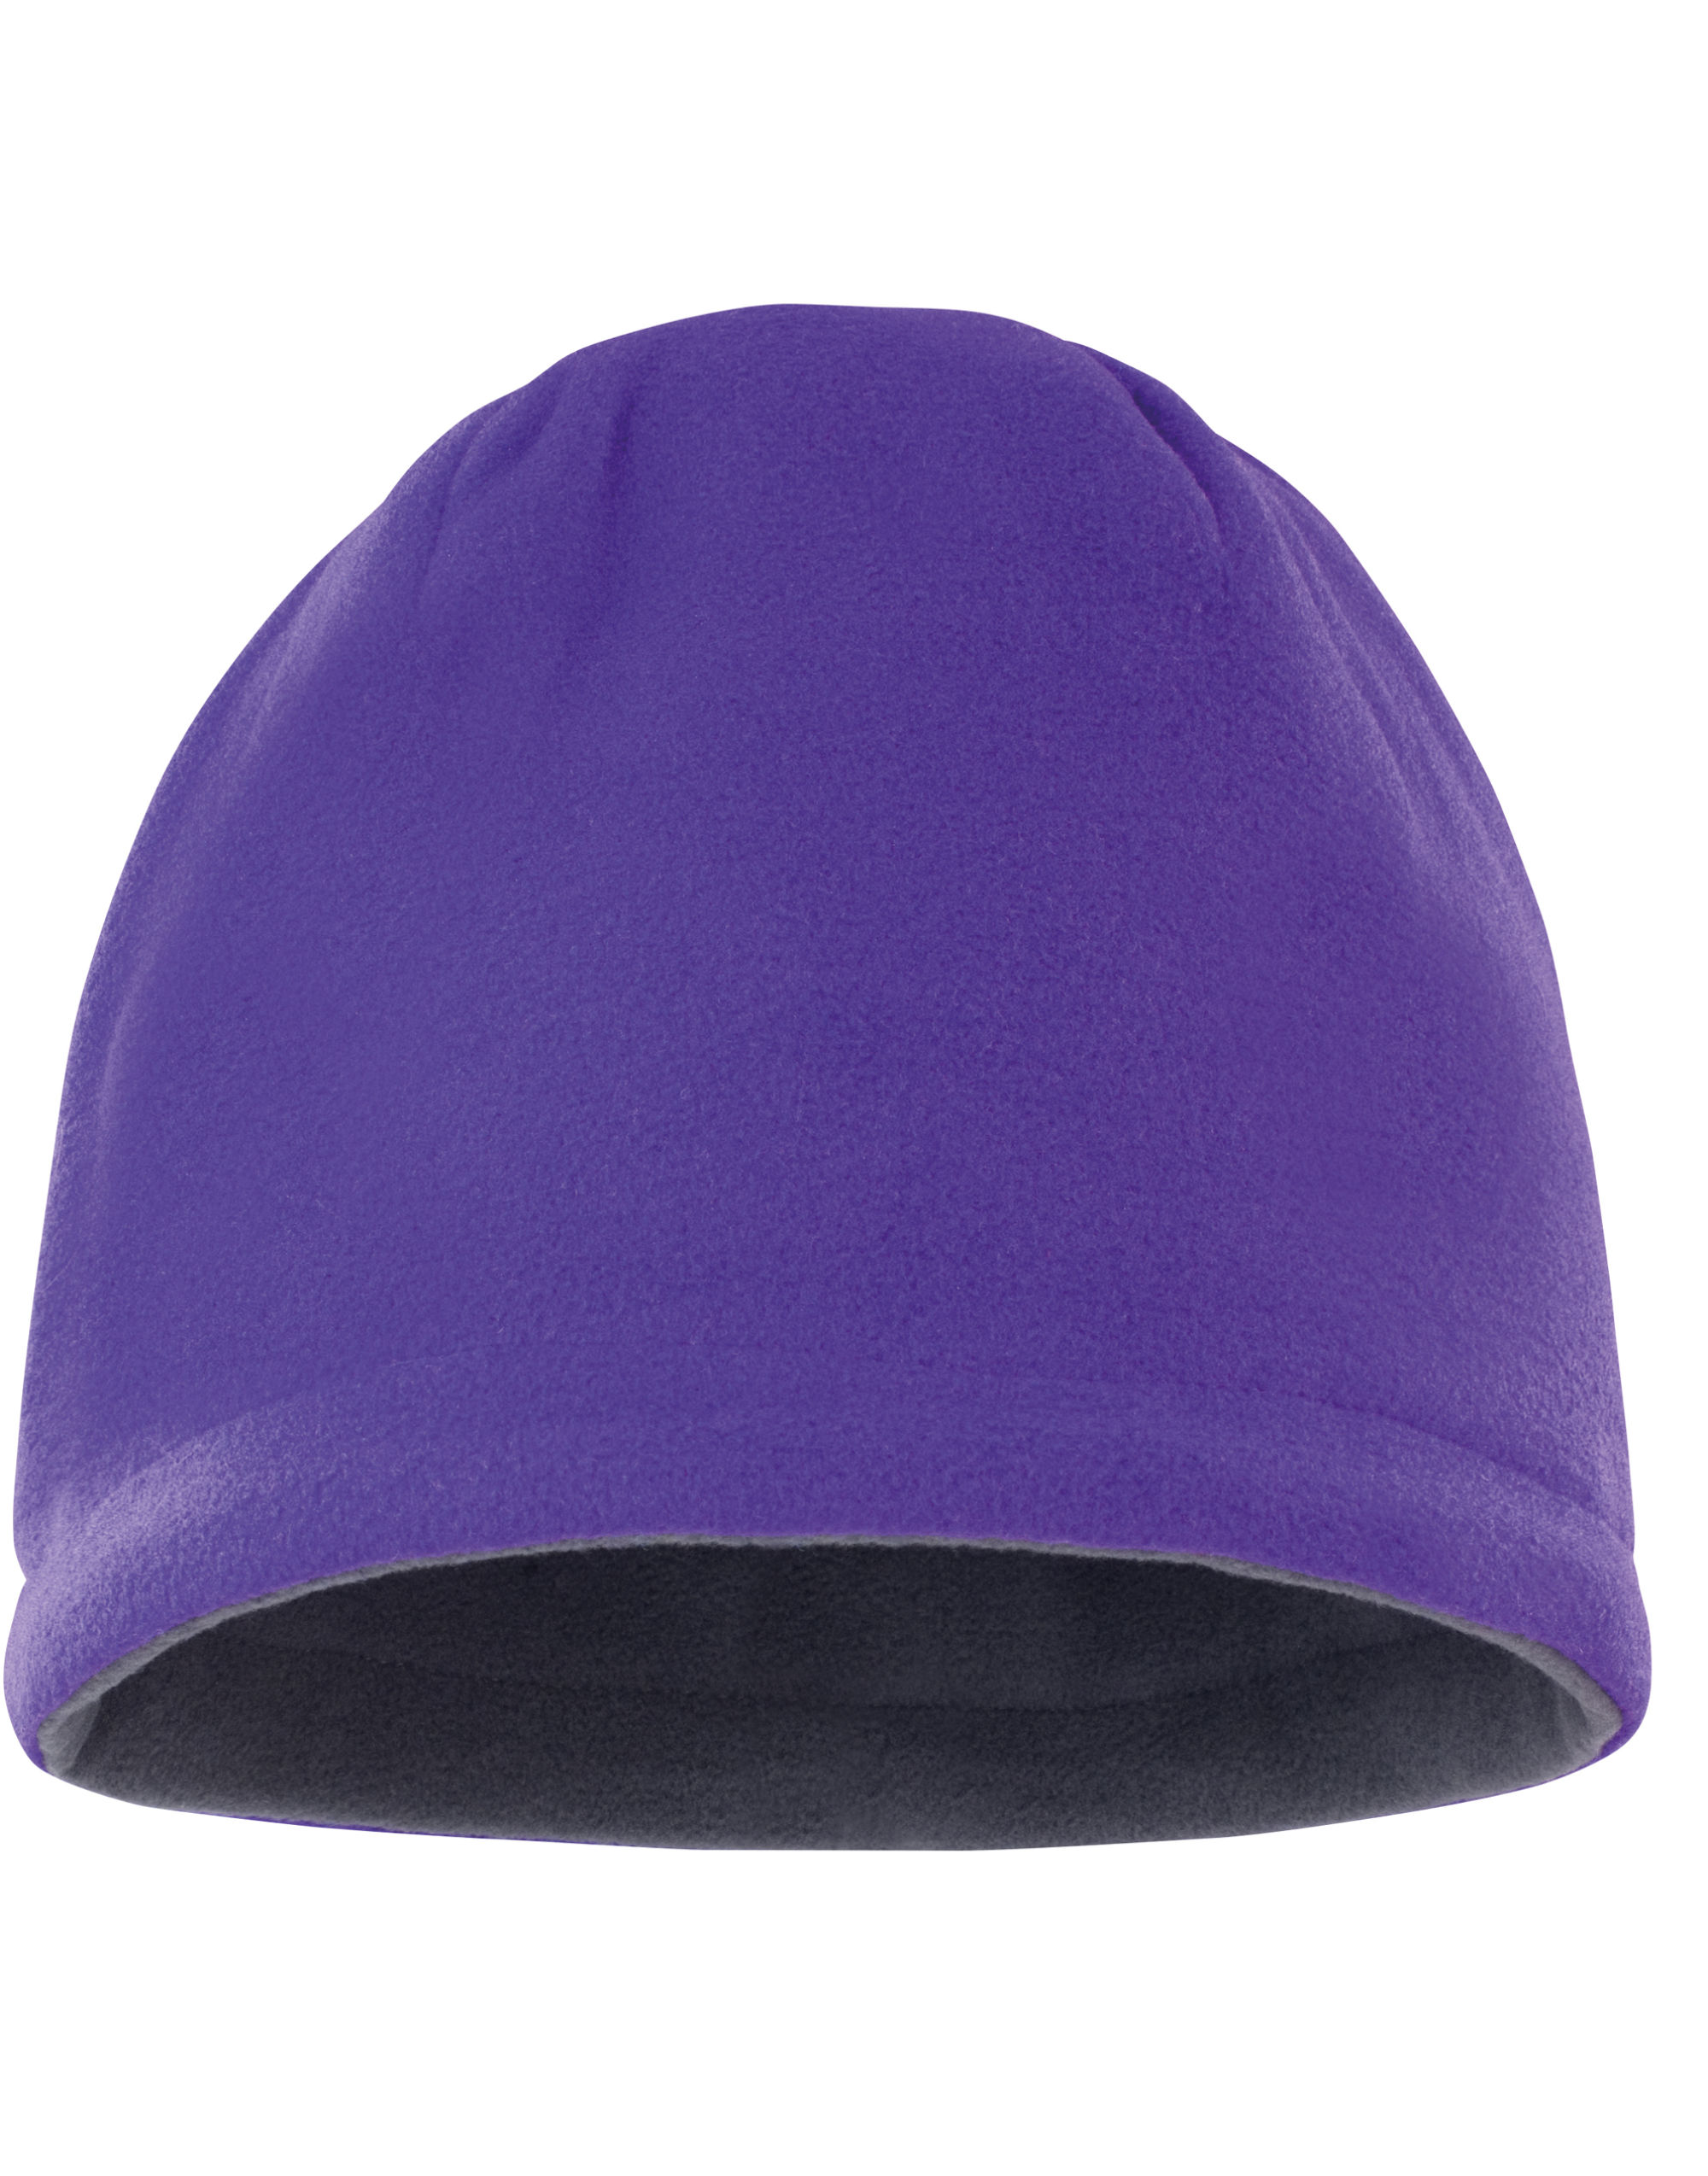 Result Winter Reversible Skull Hat